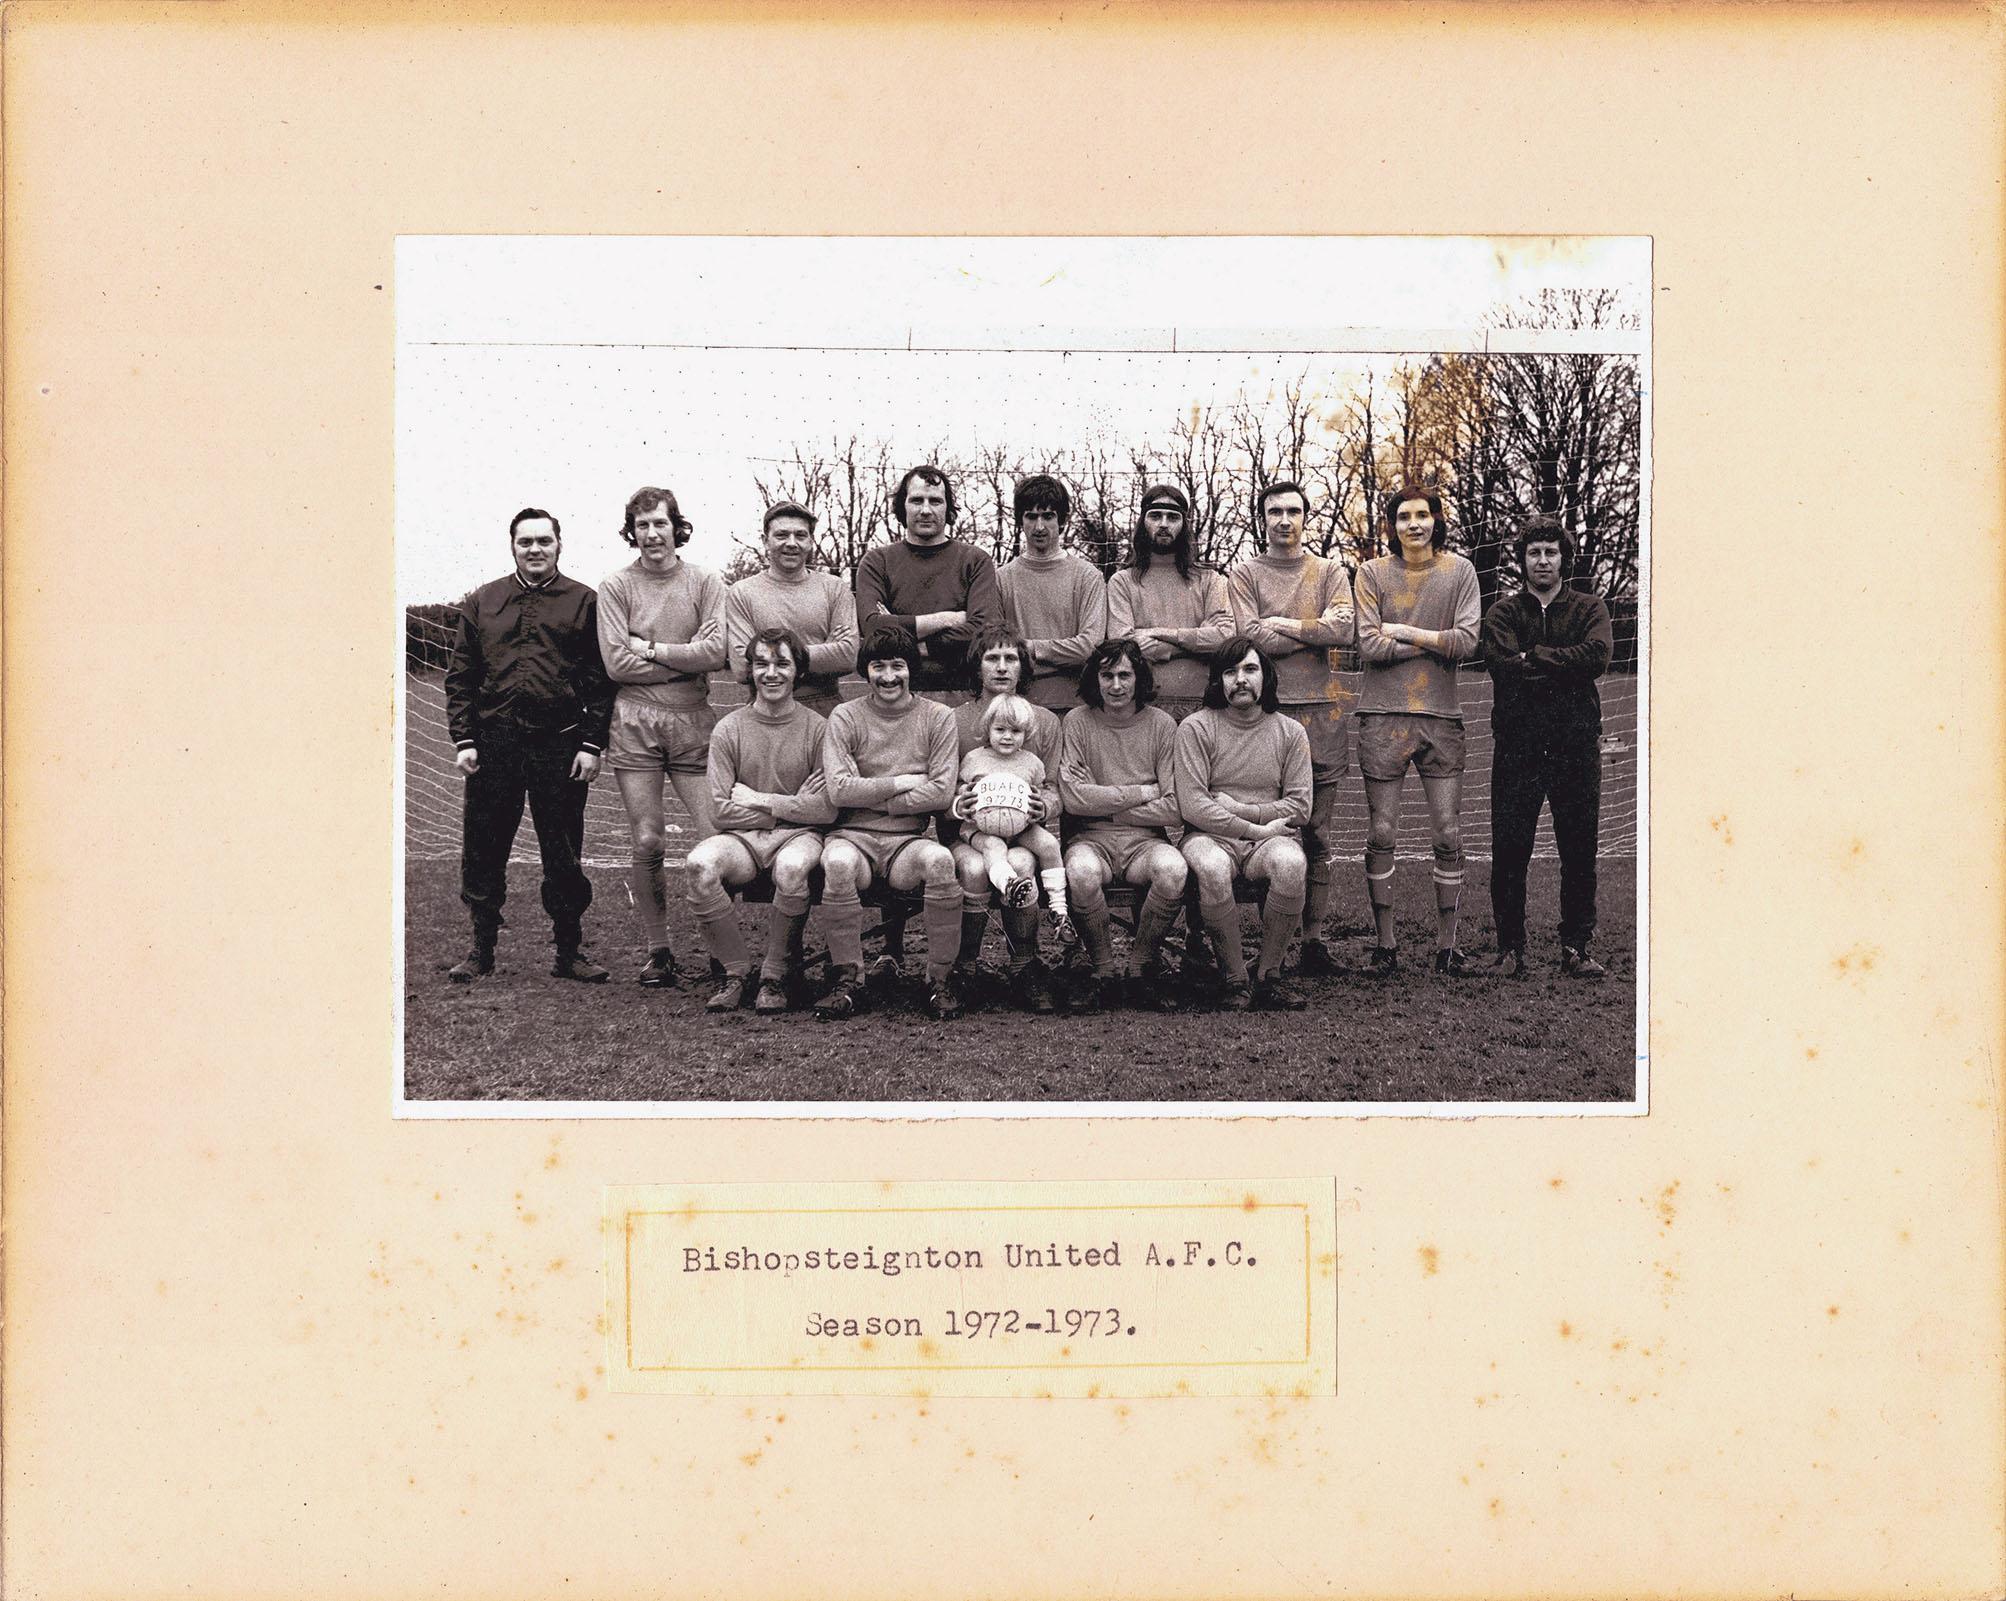 Mounted photograph of Bishopsteignton A.F.C Season 1972-1973, front.